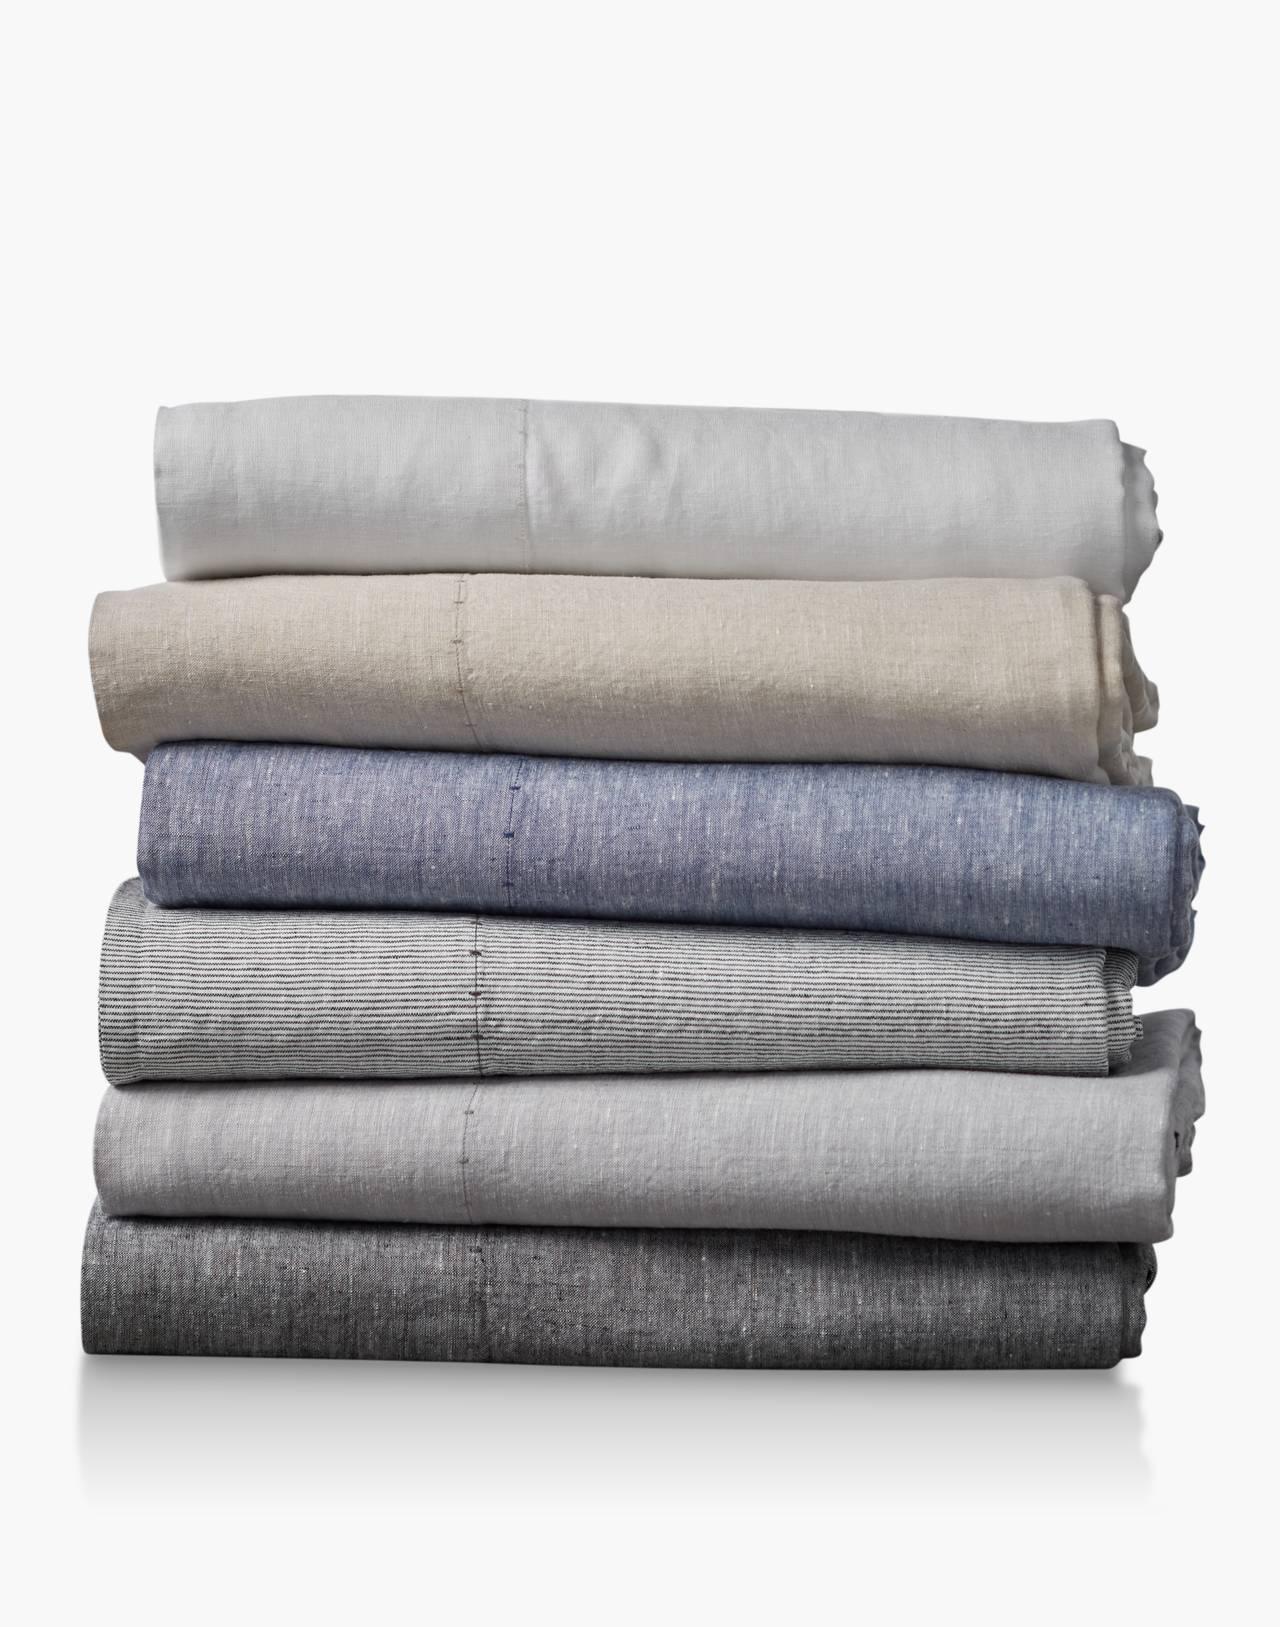 Coyuchi® Organic Linen Chambray Queen Sheet Set in gray image 3